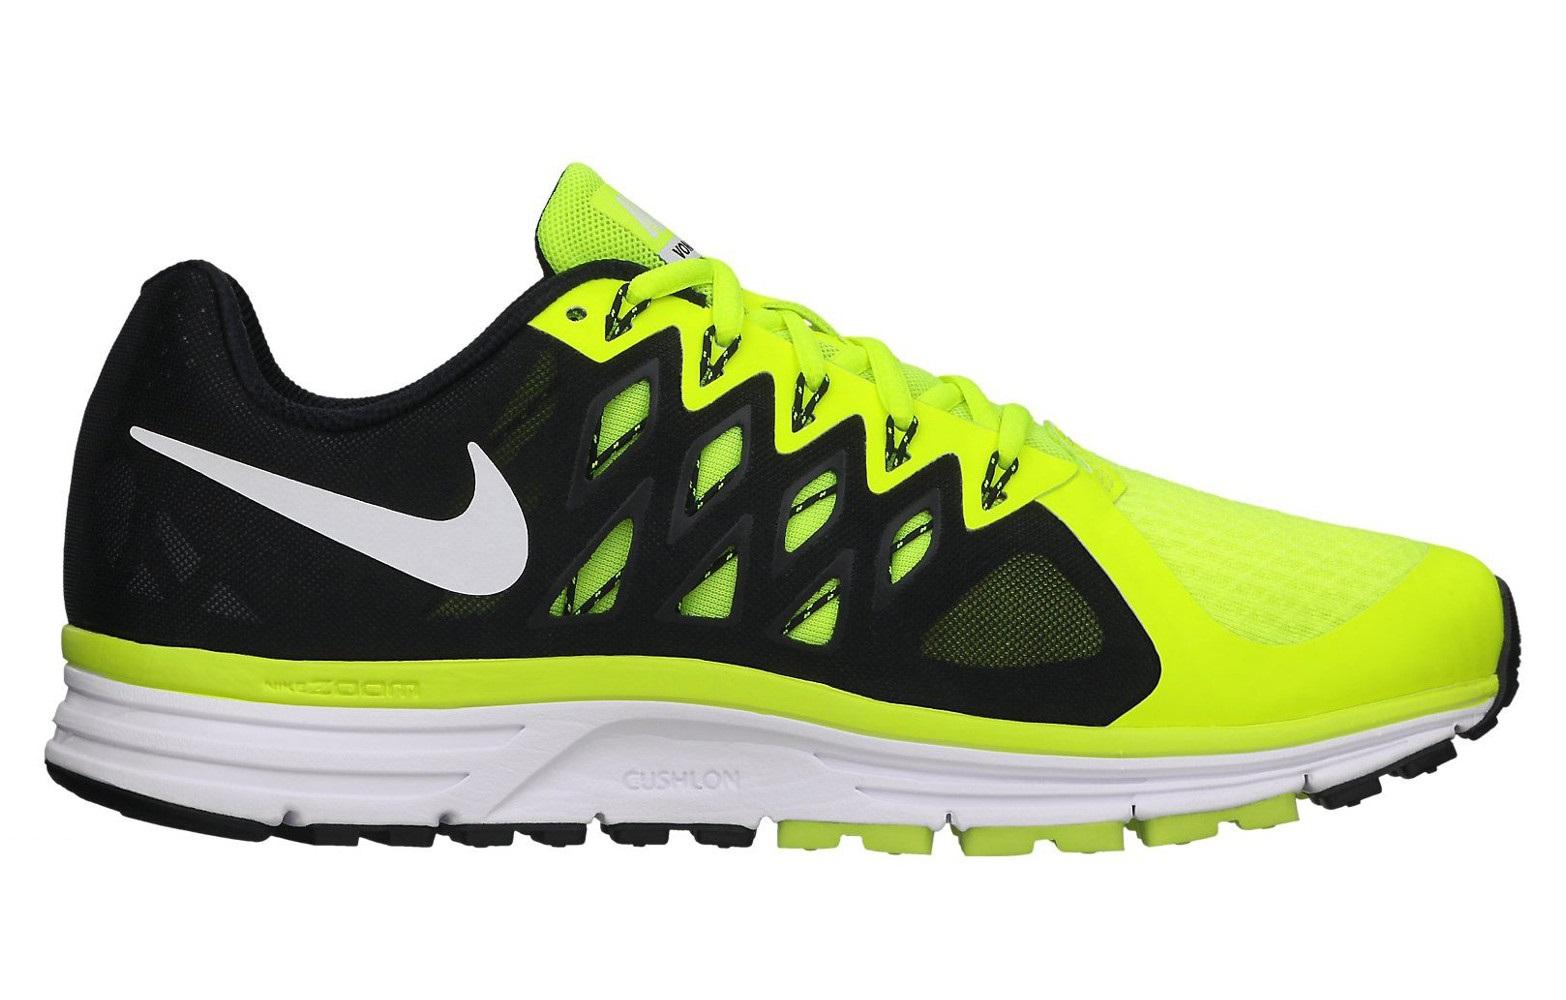 pretty nice 306d2 d3e9a NIKE Shoes AIR ZOOM VOMERO 9 Black Yellow Men